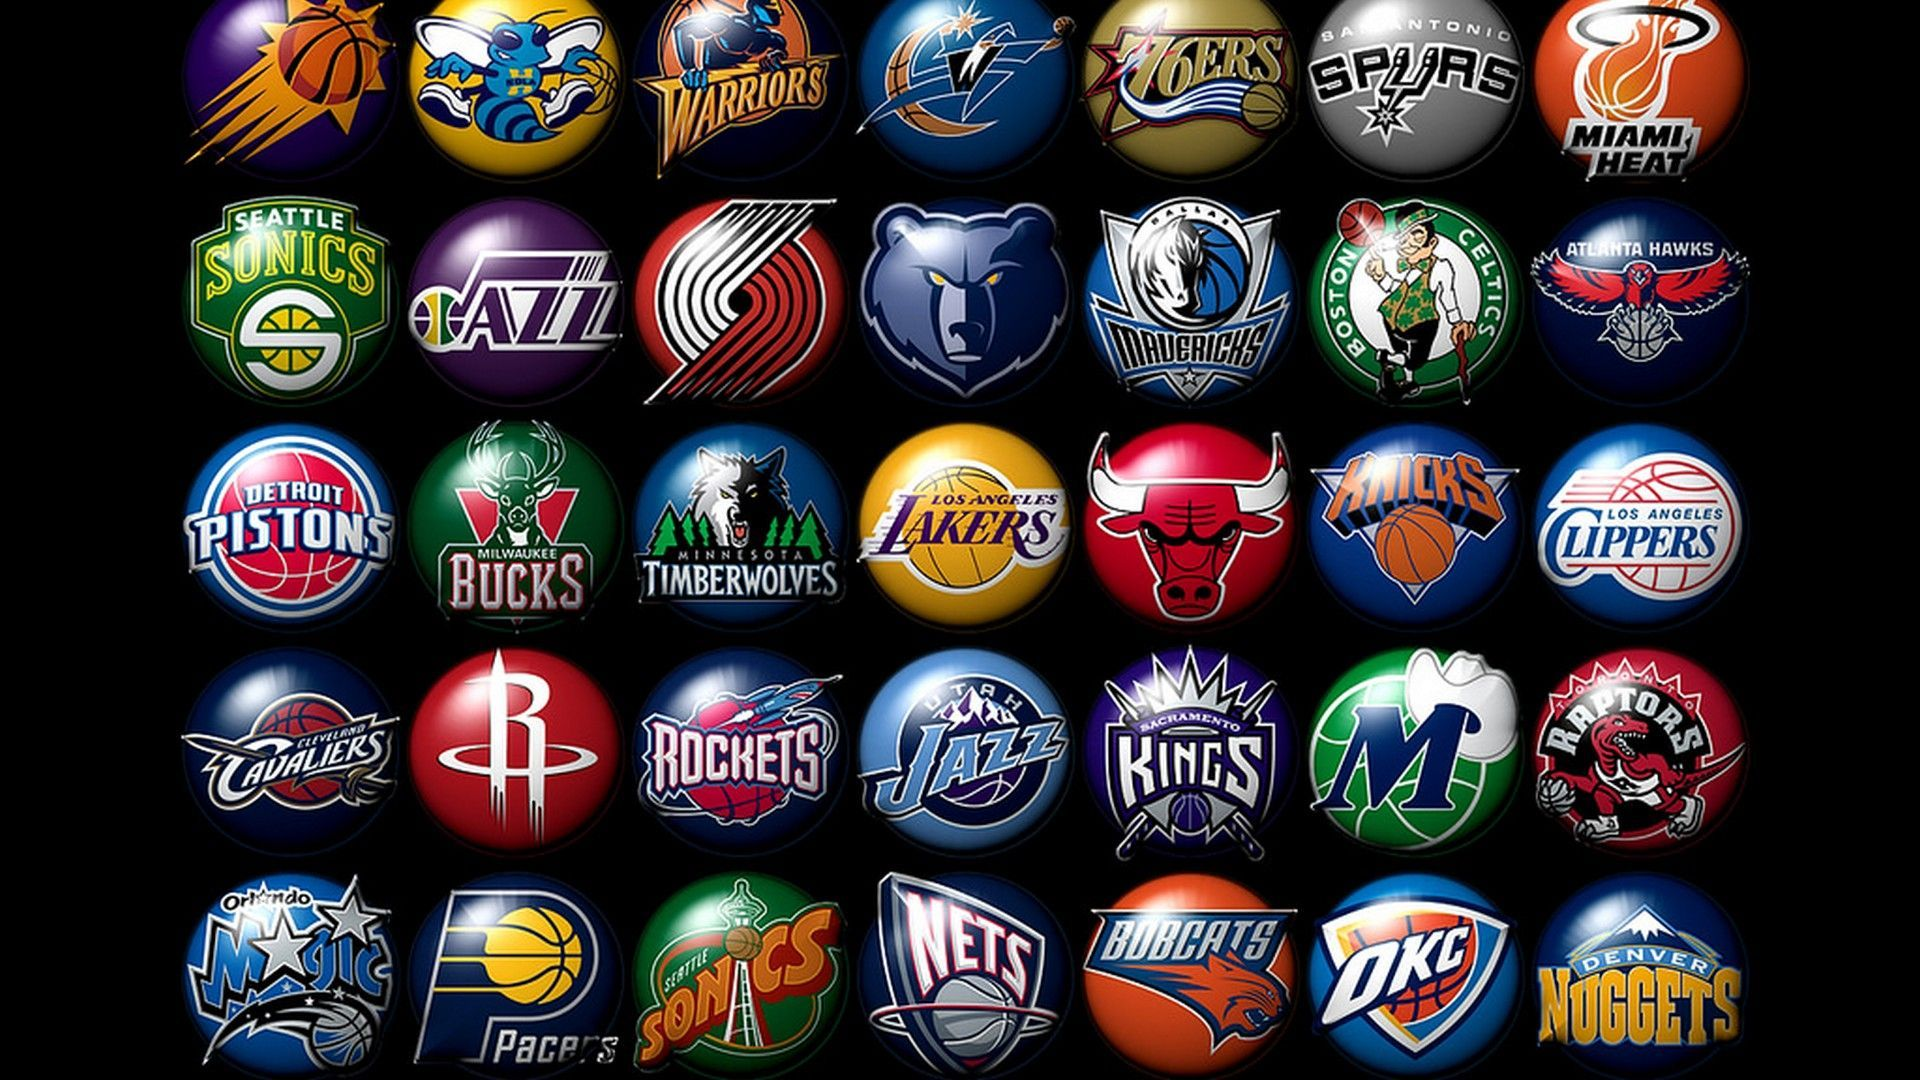 Nba Hd Wallpapers In 2020 Nba Wallpapers Basketball Wallpapers Hd Basketball Wallpaper